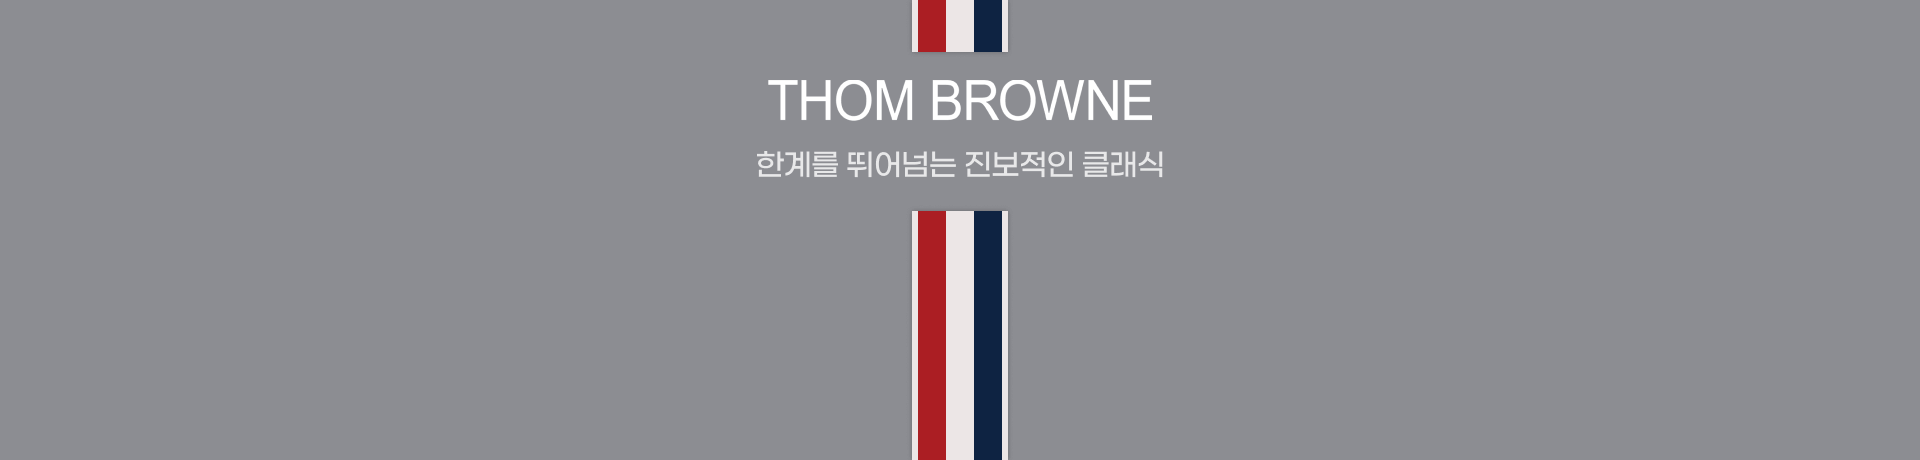 211012_sy_thom-browne_pc-_8c8d92